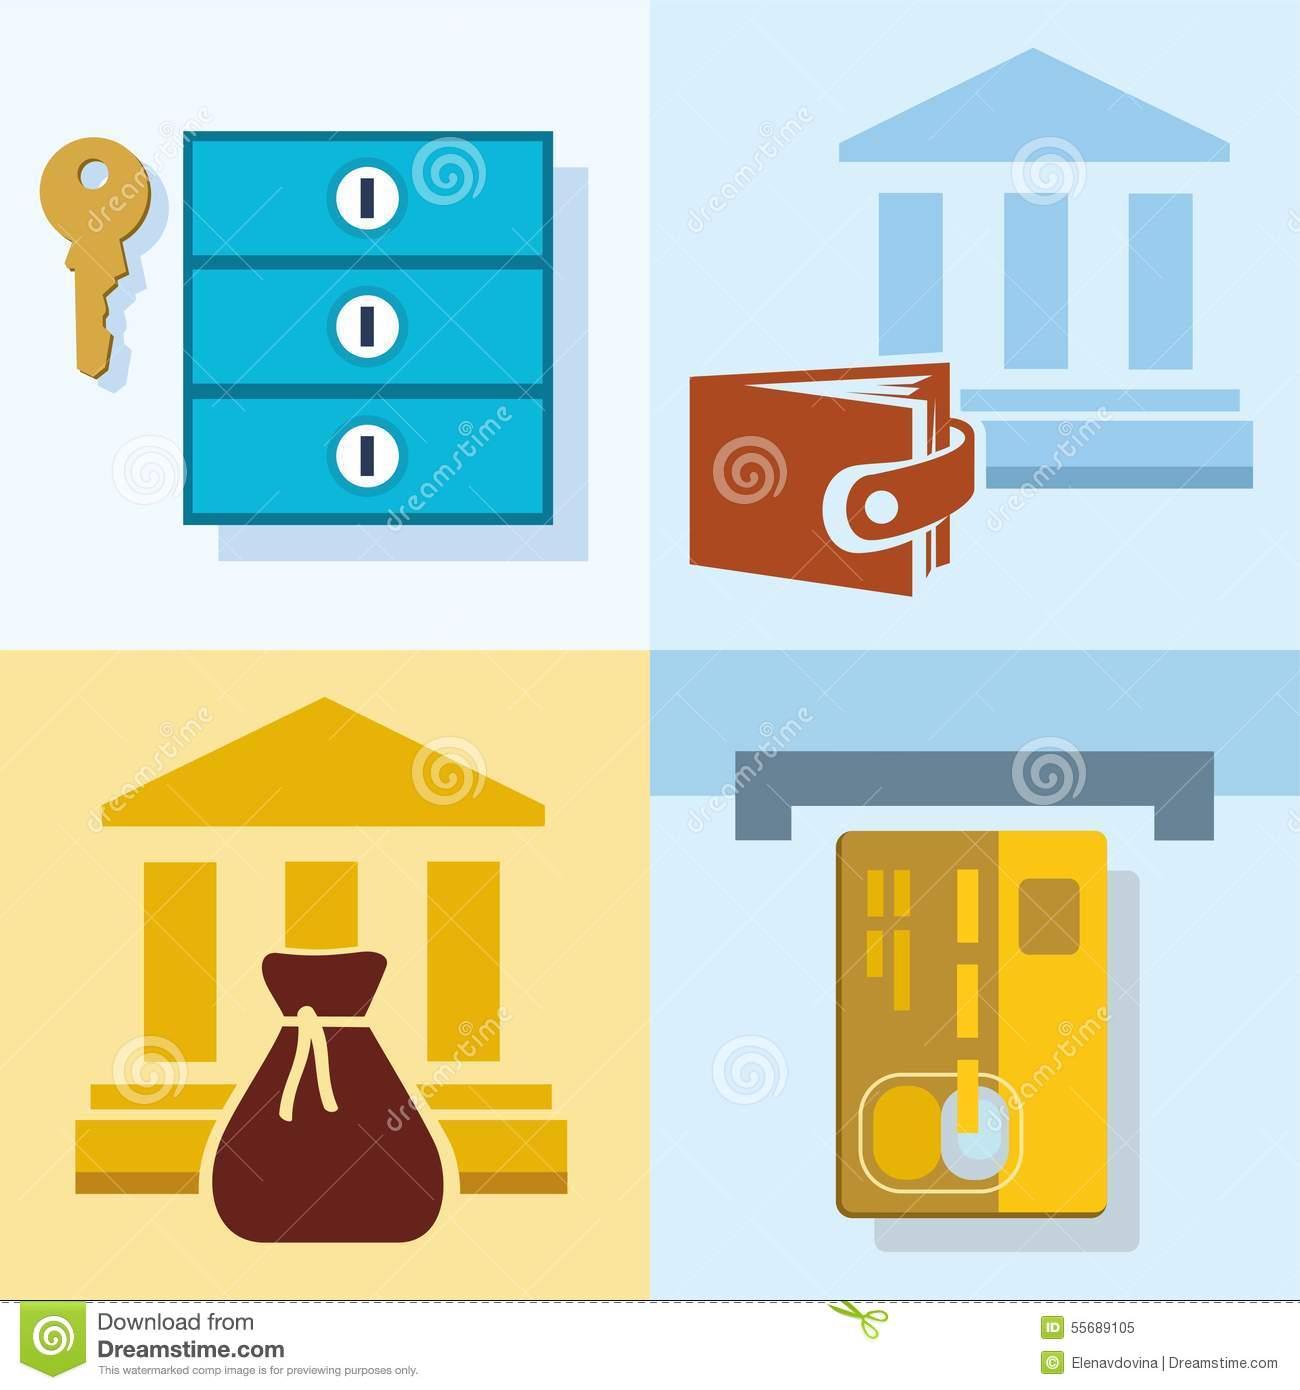 Bank deposit clipart clip art royalty free Bank, Finance, Savings, Credit Cards, Safe Deposit Boxes, Colored ... clip art royalty free